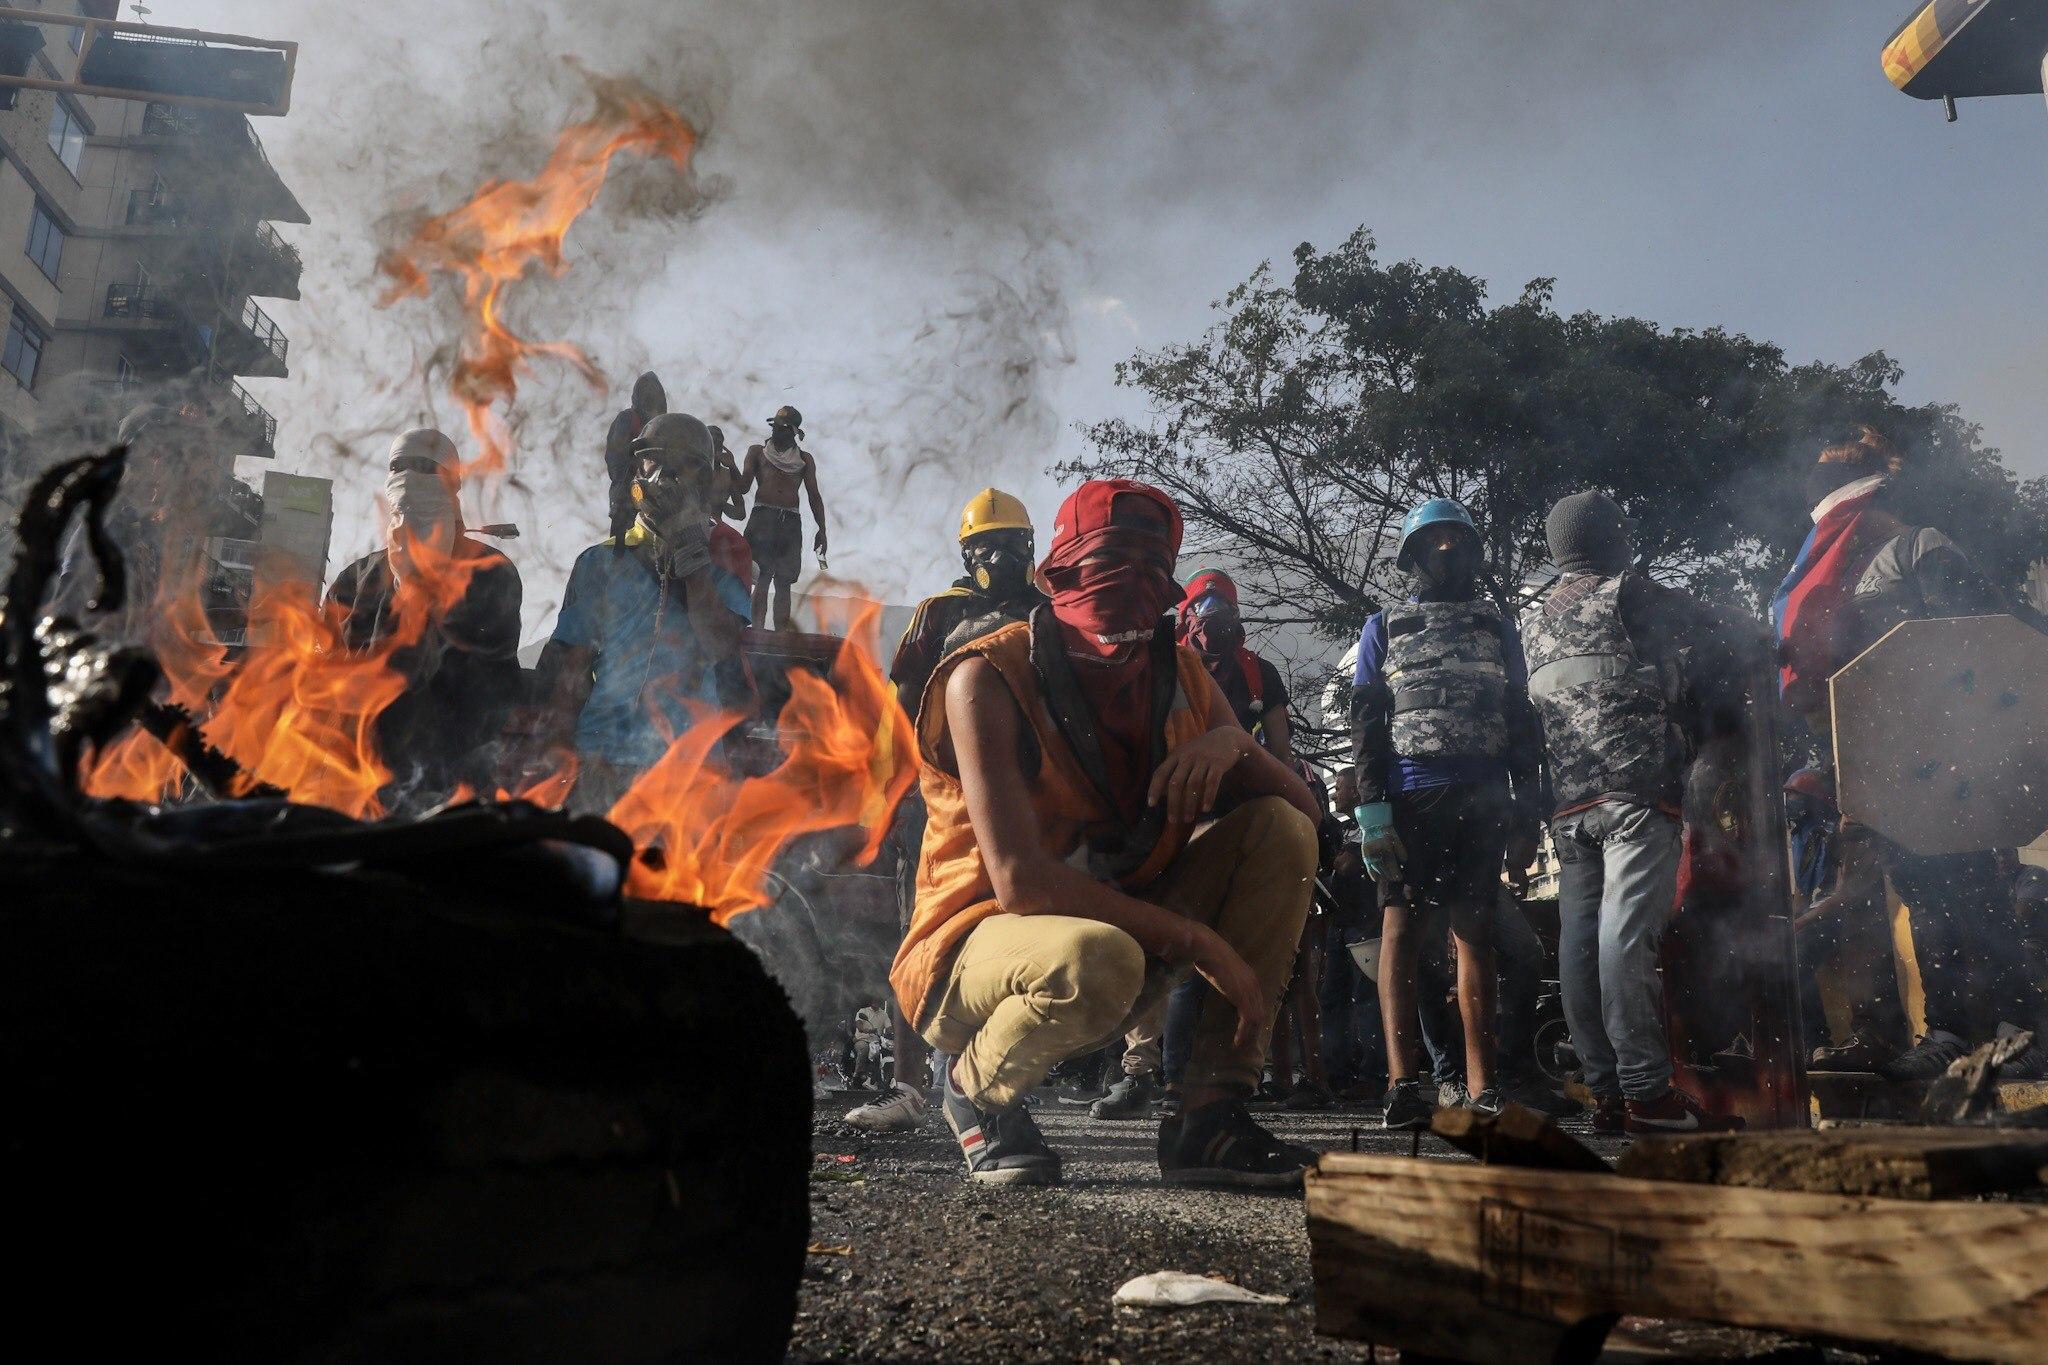 Desenes de manifestants tanquen una via amb una barricada en flames durant una protesta antigovernamental a Caracas (Veneçuela). /MIGUEL GUTIÉRREZ